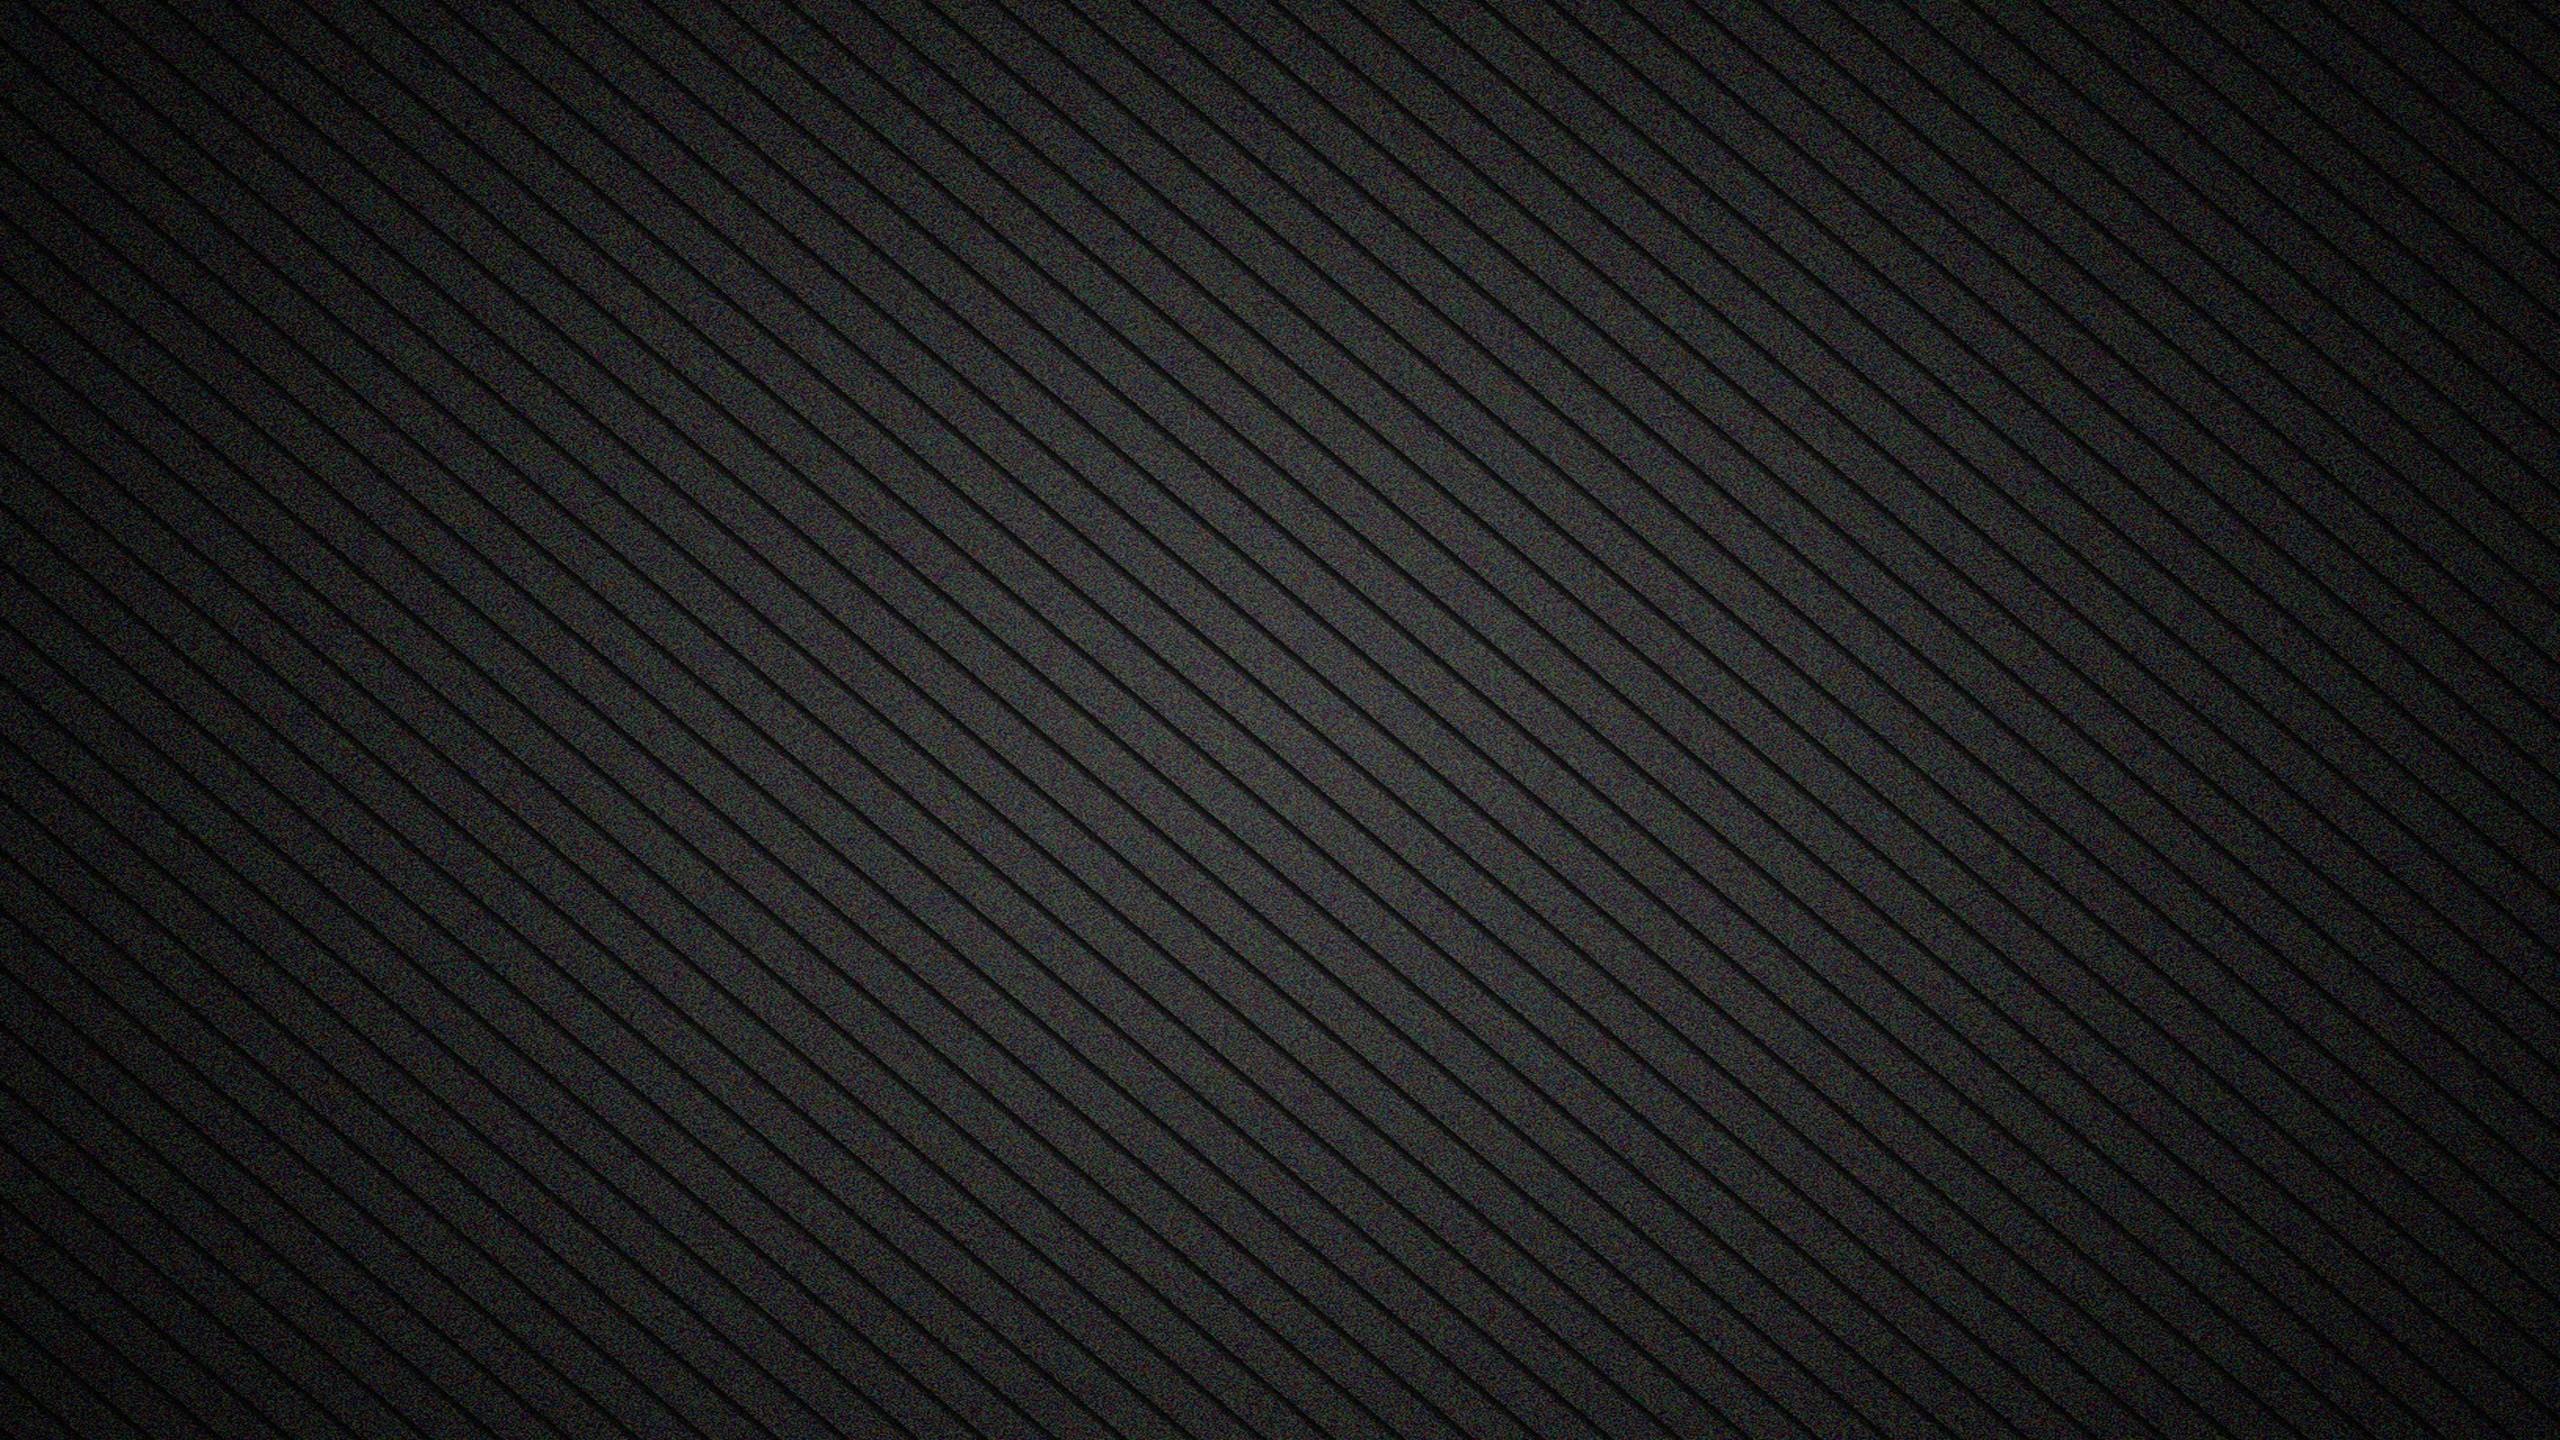 wallpaper B wallpapertp 2560×1440 Wallpaper 2560 x 1440 (41 Wallpapers)   · Black  Wallpaper